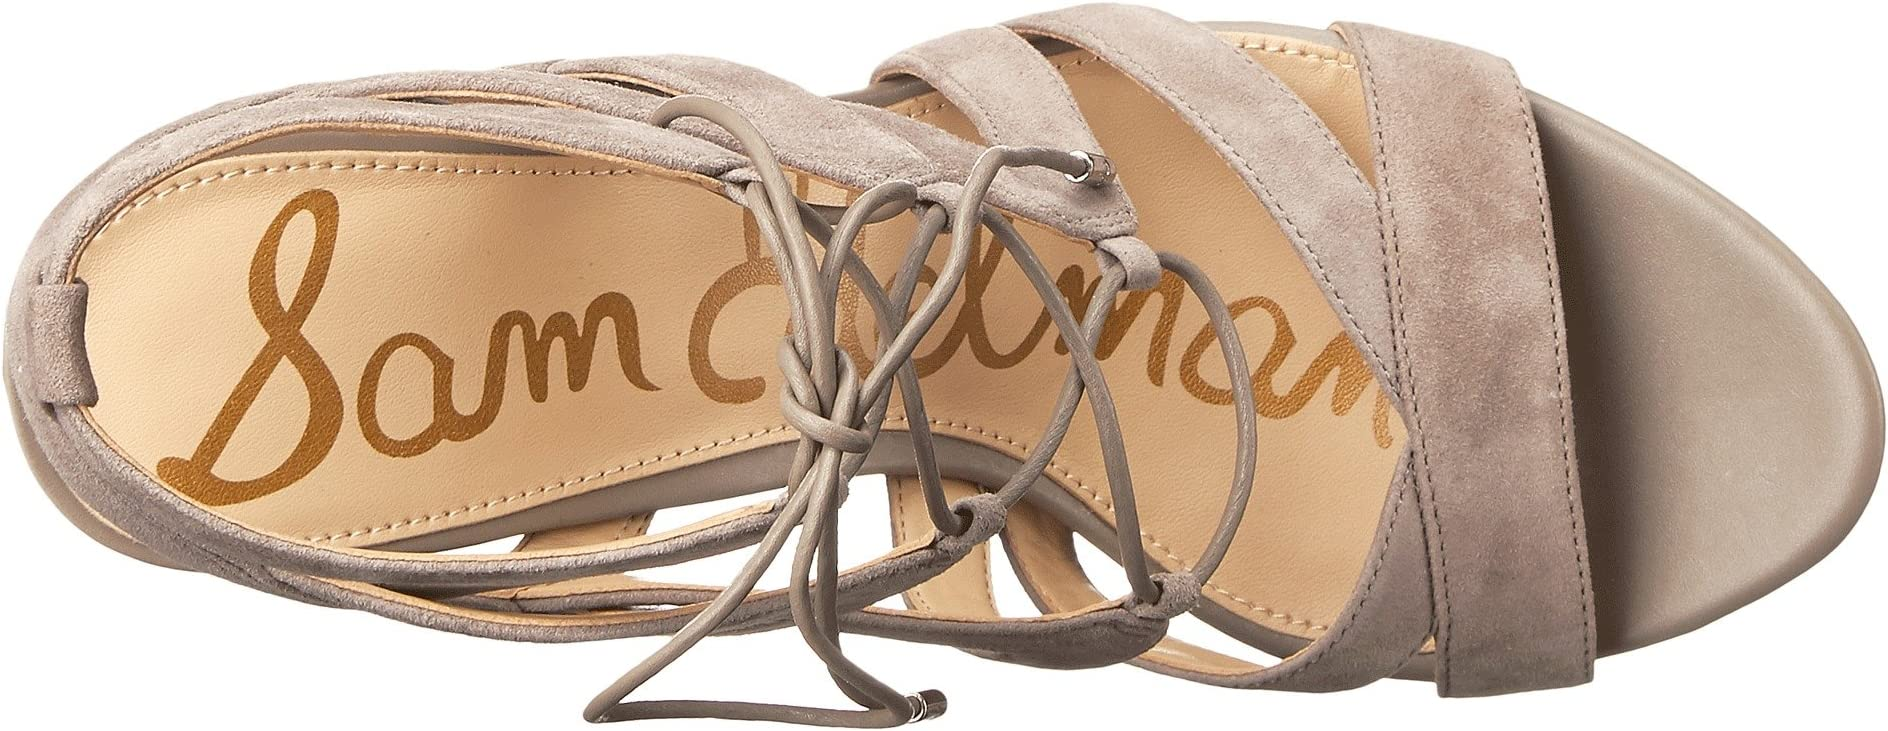 Sam Edelman Yardley | Women's shoes | 2020 Newest